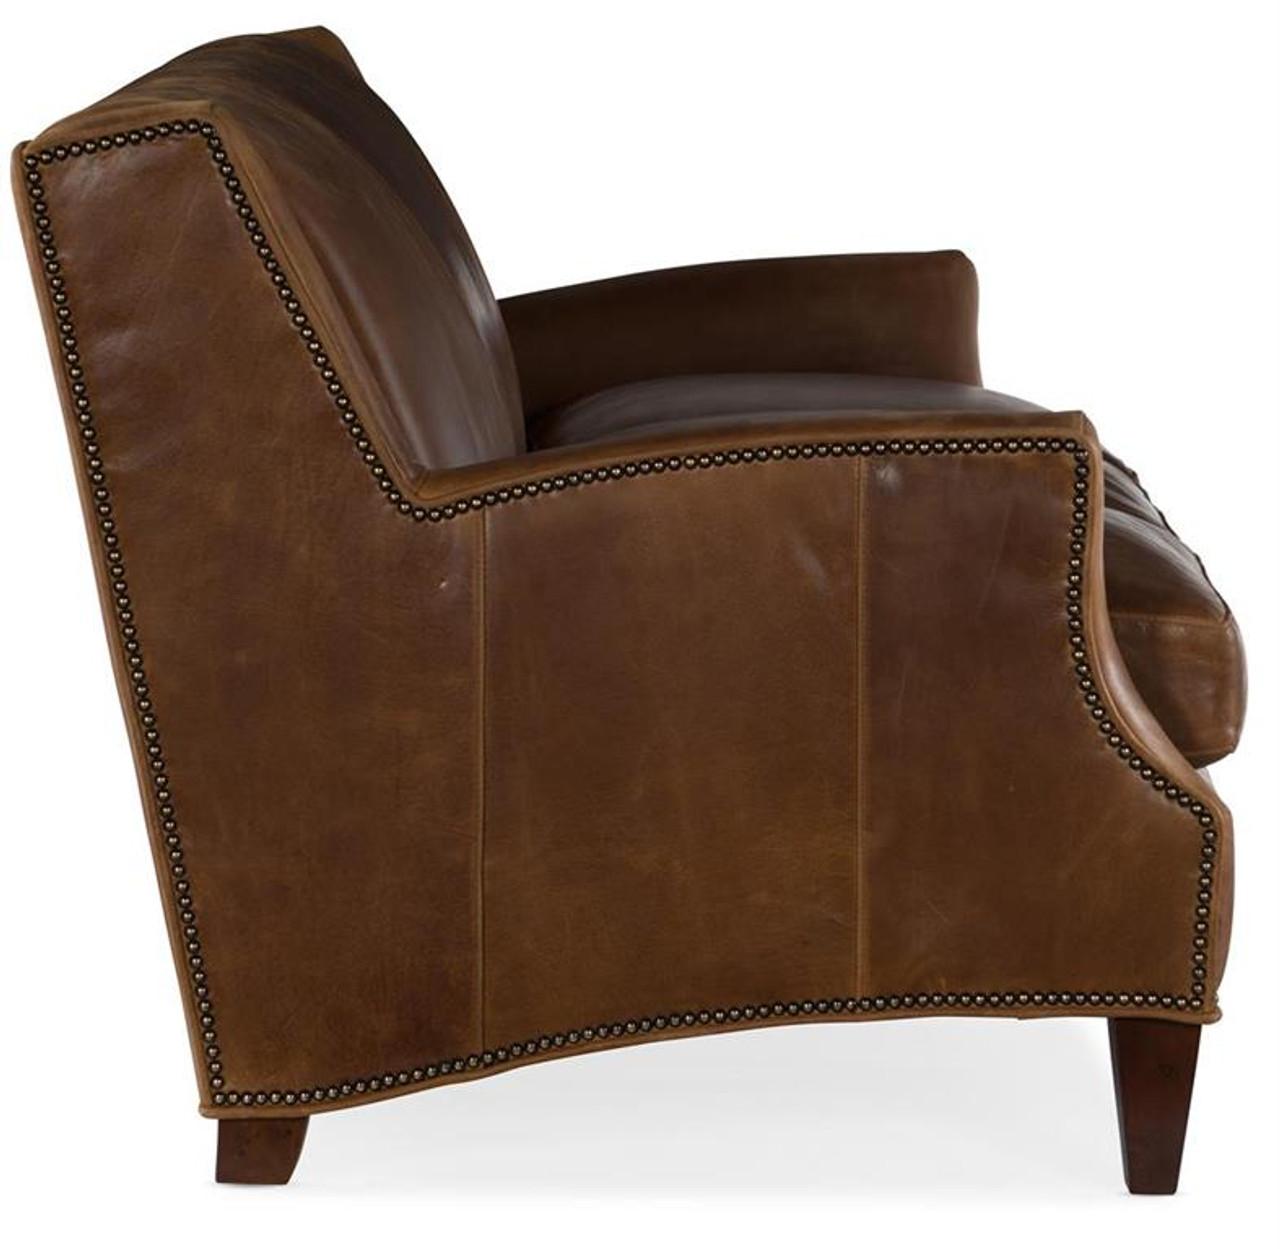 Brilliant Bradington Young 413 Kane Sofa Evergreenethics Interior Chair Design Evergreenethicsorg